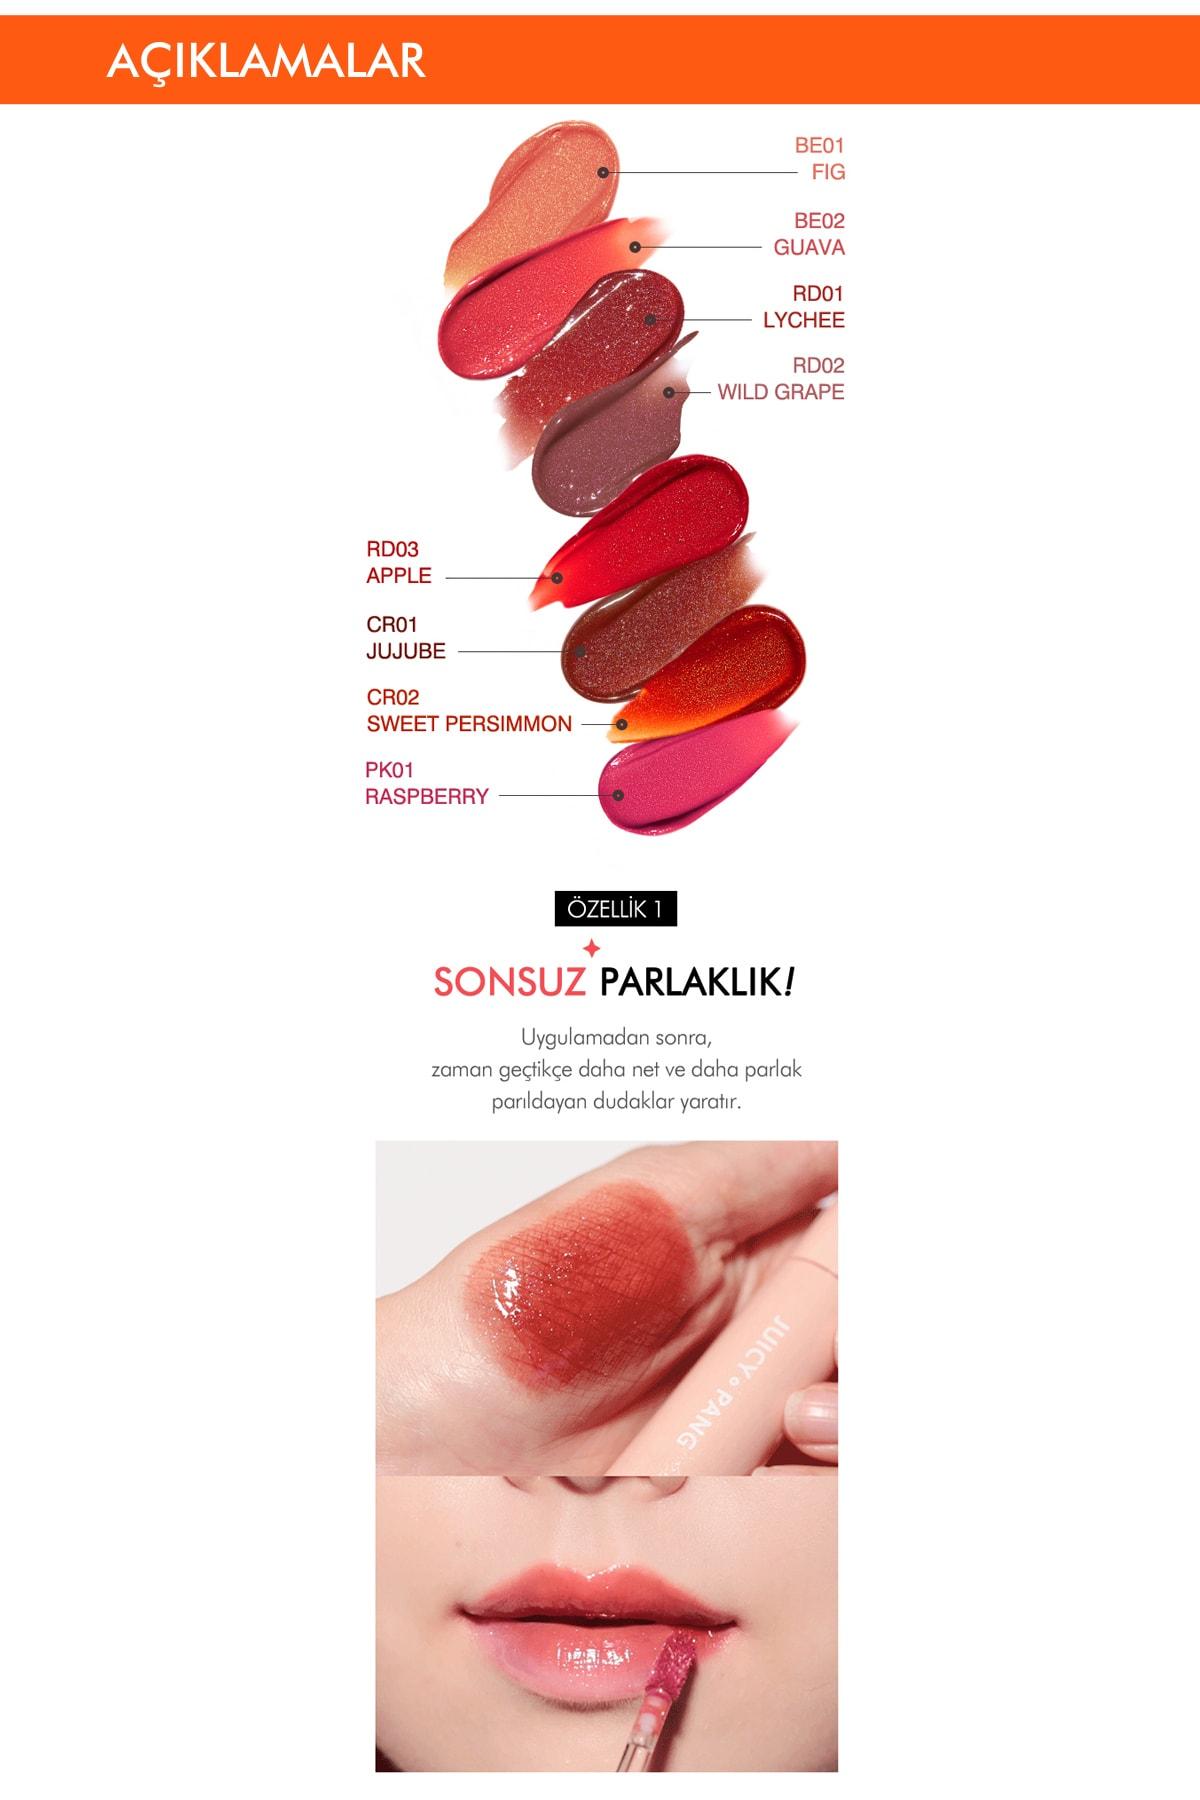 Missha Işıltı&Dolgunluk Veren Parlak Gloss Tint APIEU Juicy-Pang Sparkling Tint PK01 2